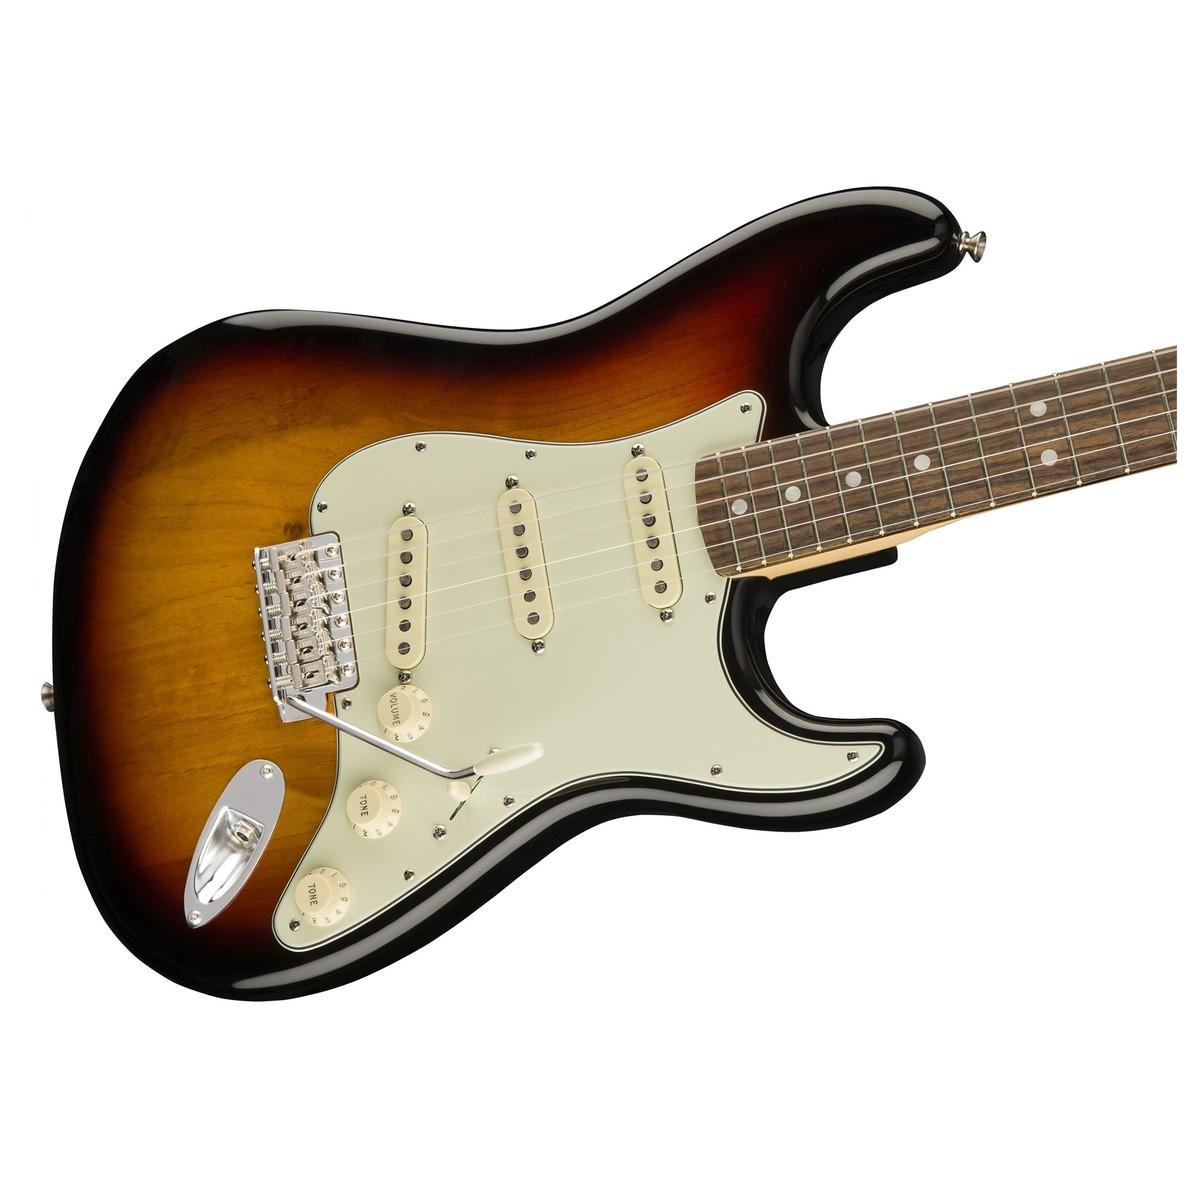 fender american original 39 60s stratocaster rw 3 tone sunburst at gear4music. Black Bedroom Furniture Sets. Home Design Ideas